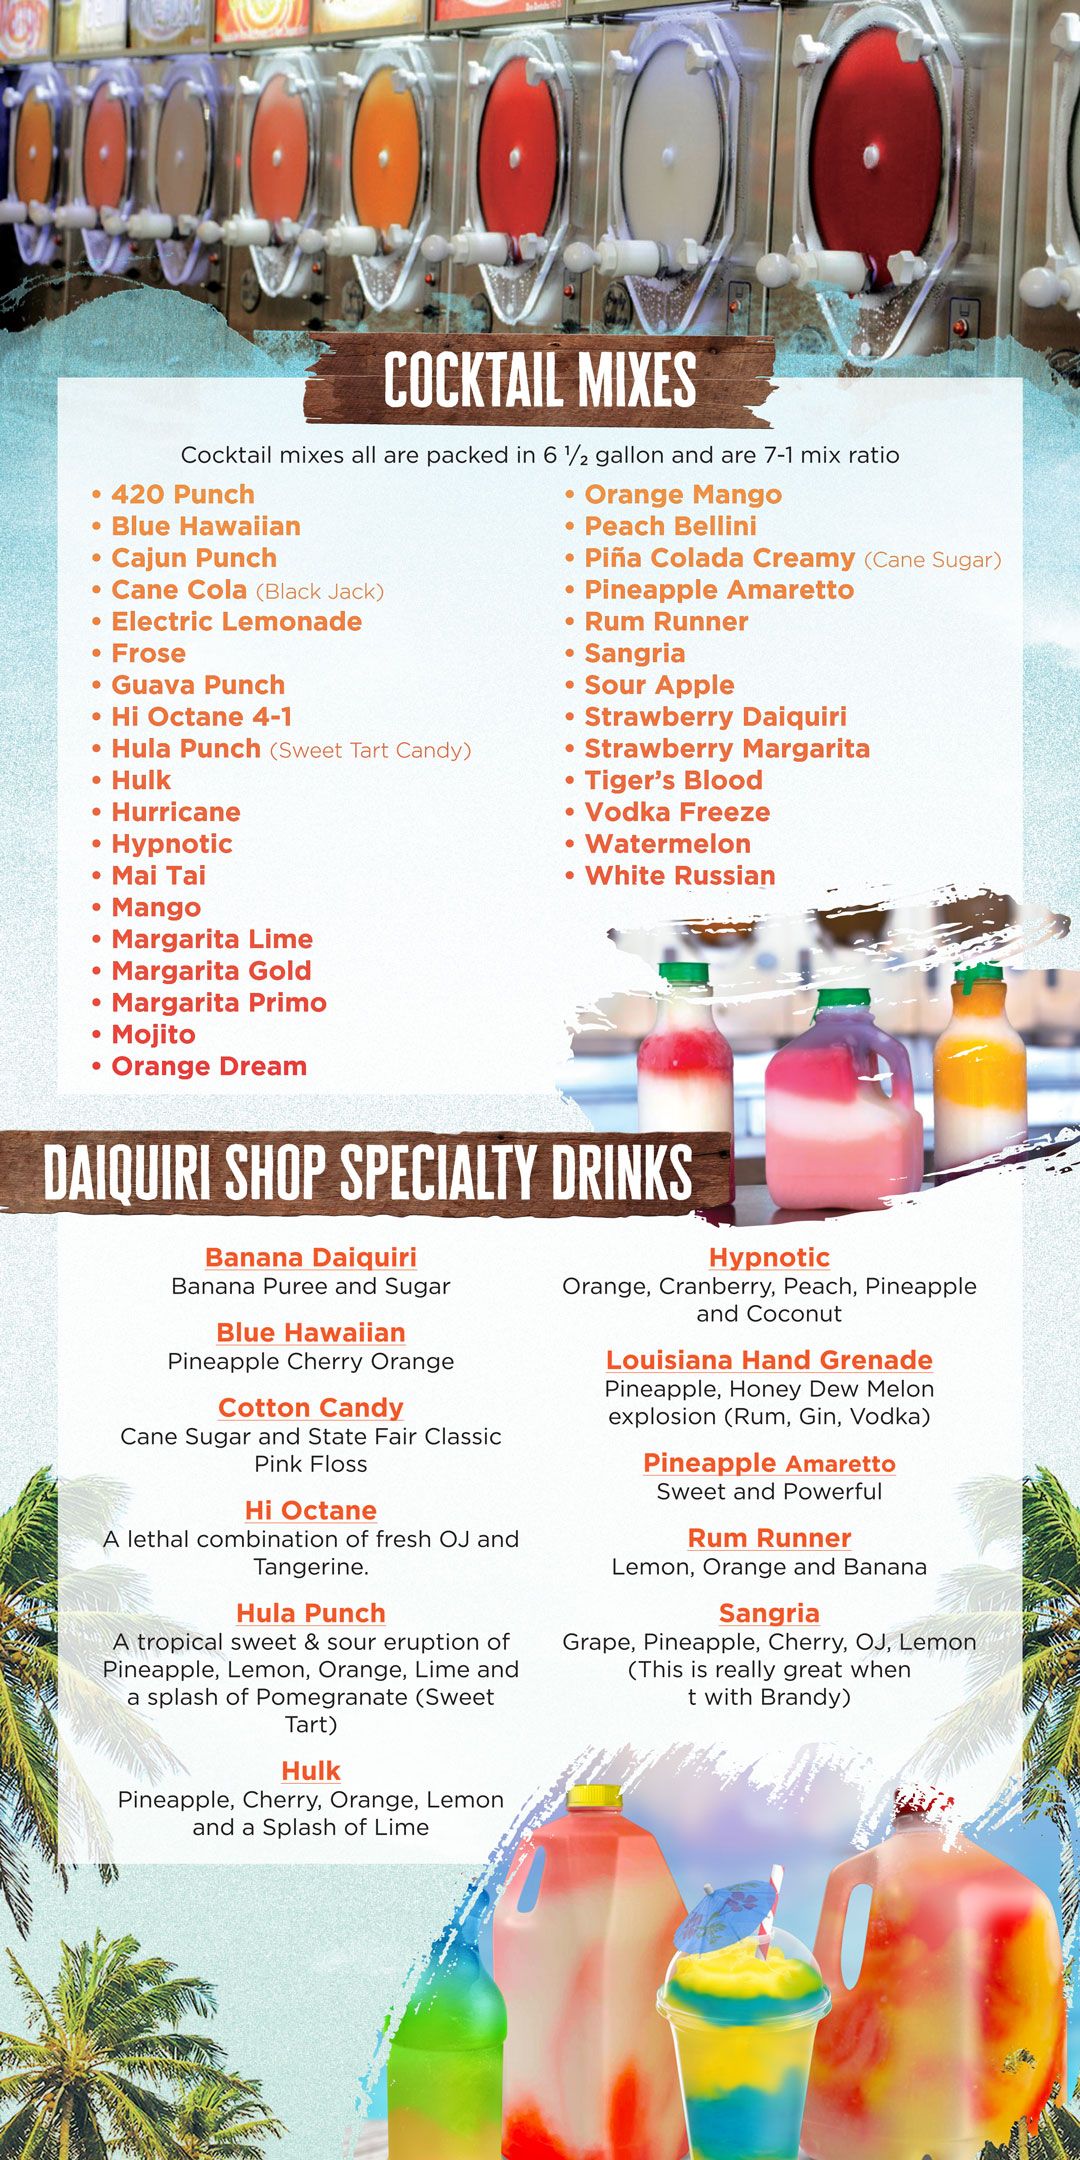 Cocktail Mixes & Daiquiri Ship Drinks